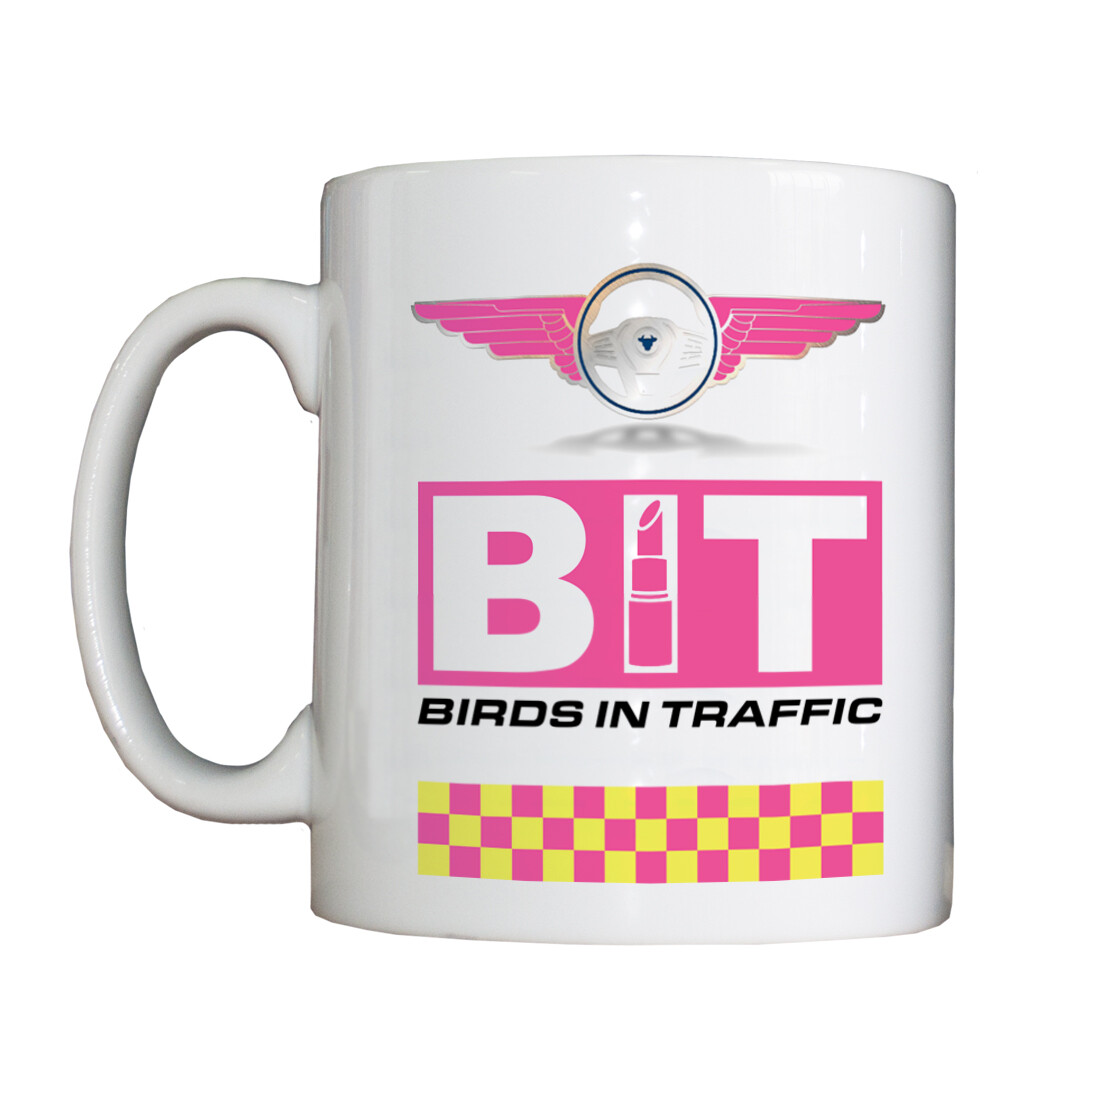 Personalised 'Birds in Traffic' Drinking Vessel